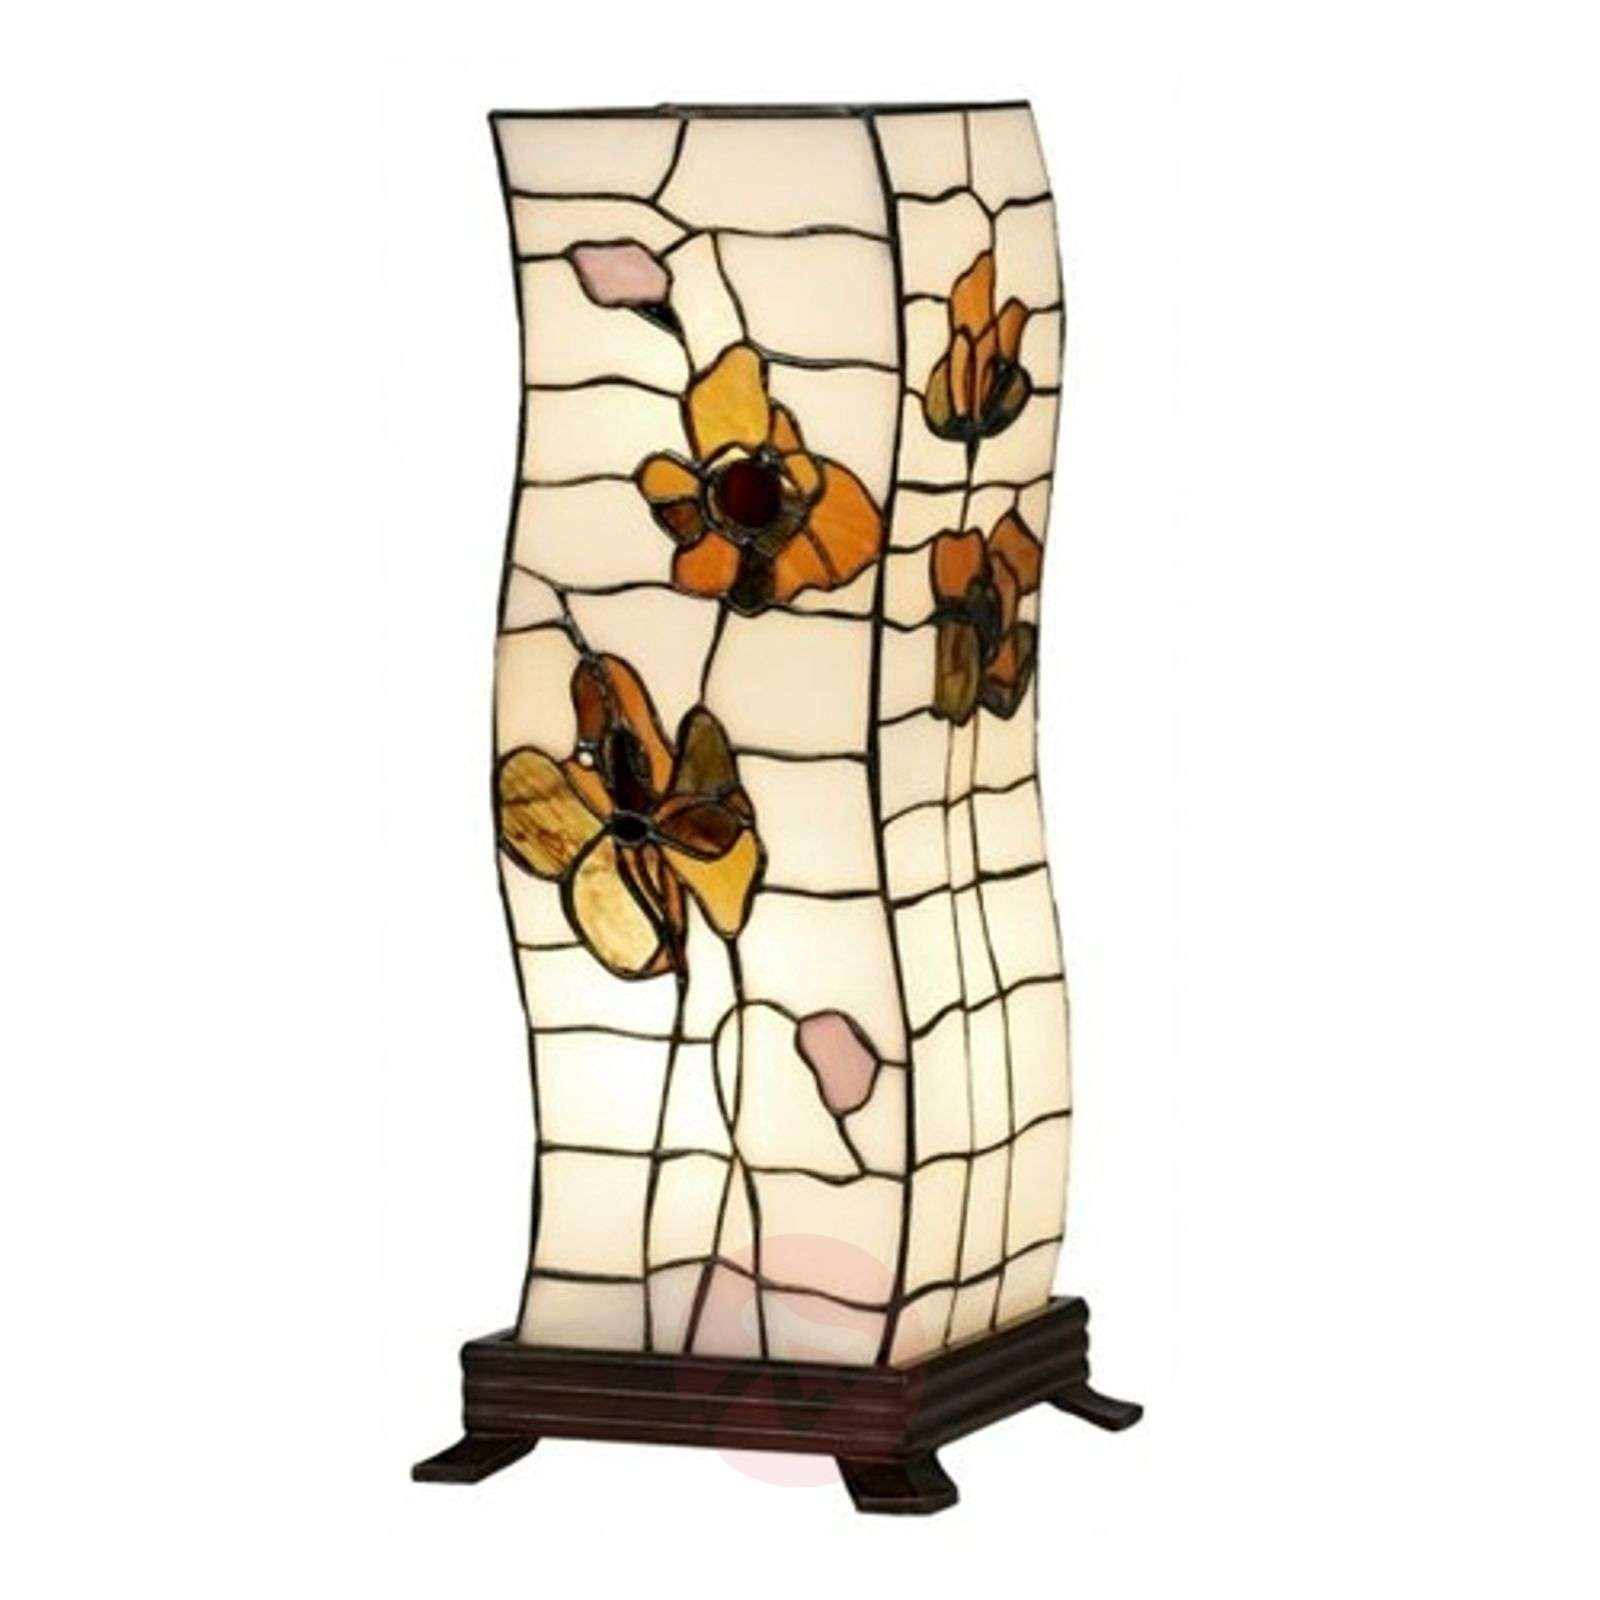 Tiffany-tyylinen Blossom-pöytävalaisin-1032026-01